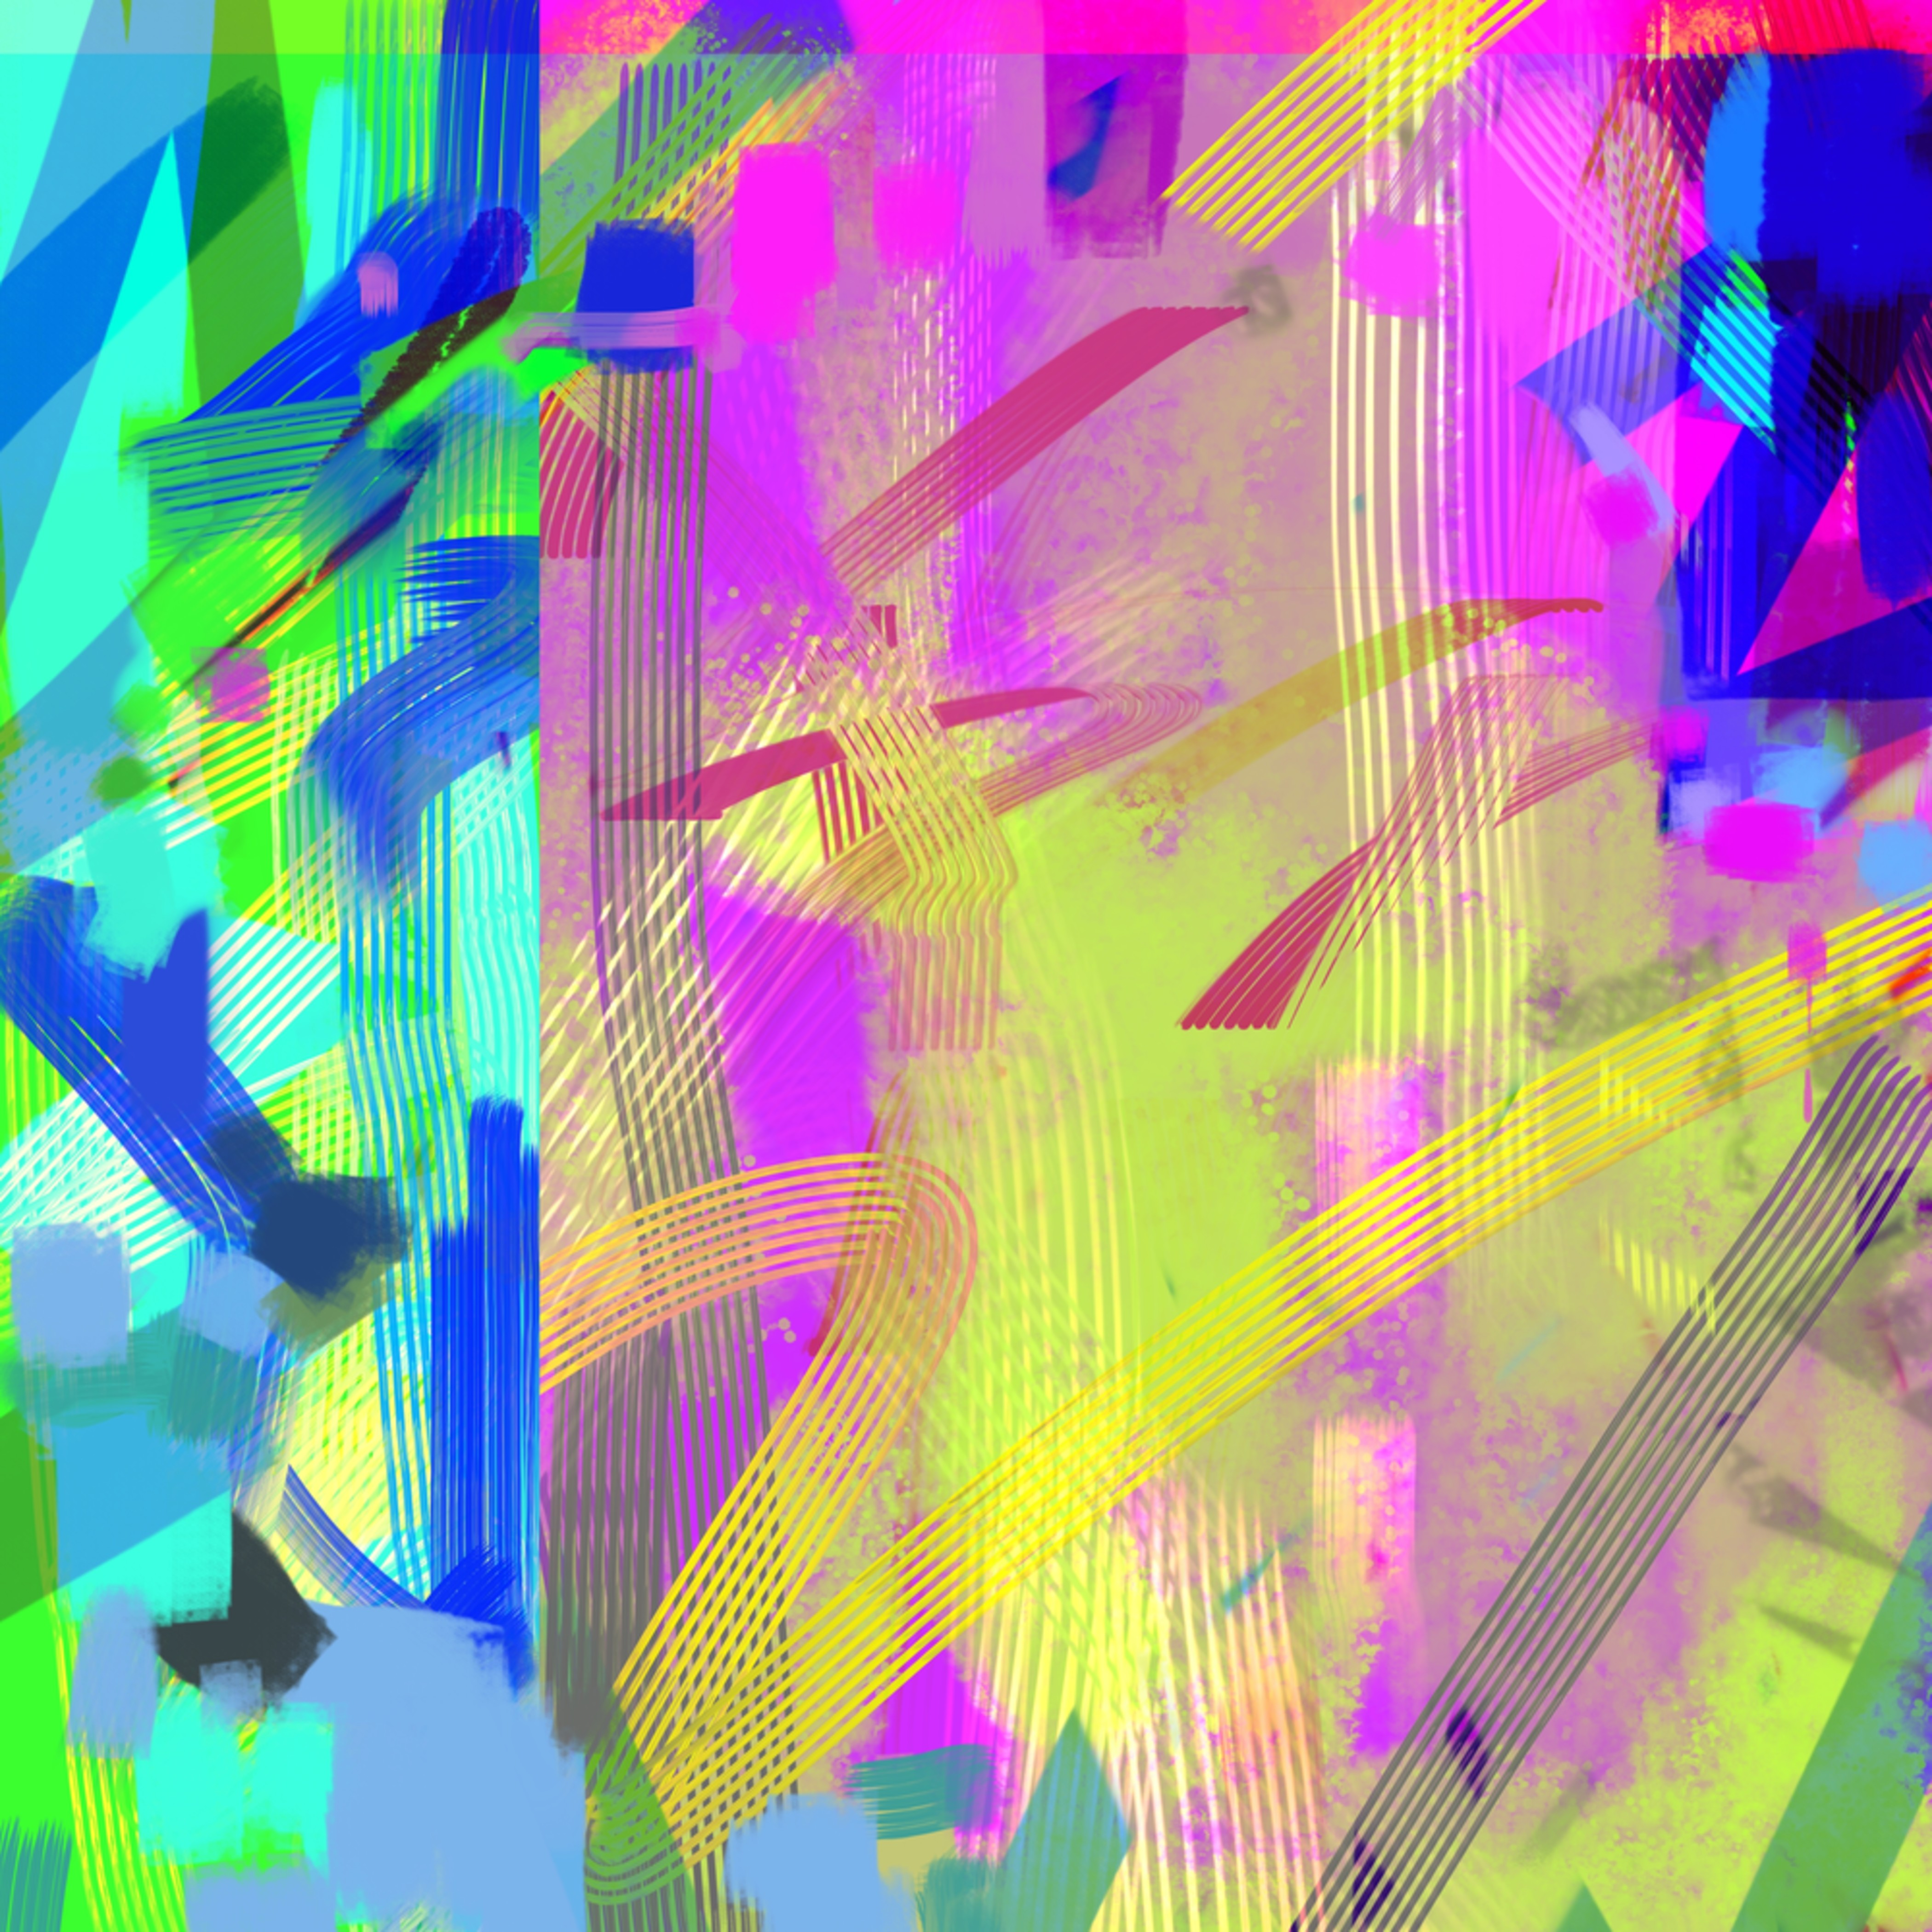 4 25 20 digital drawing high chroma abstract 1 jpeg version vmnrmj